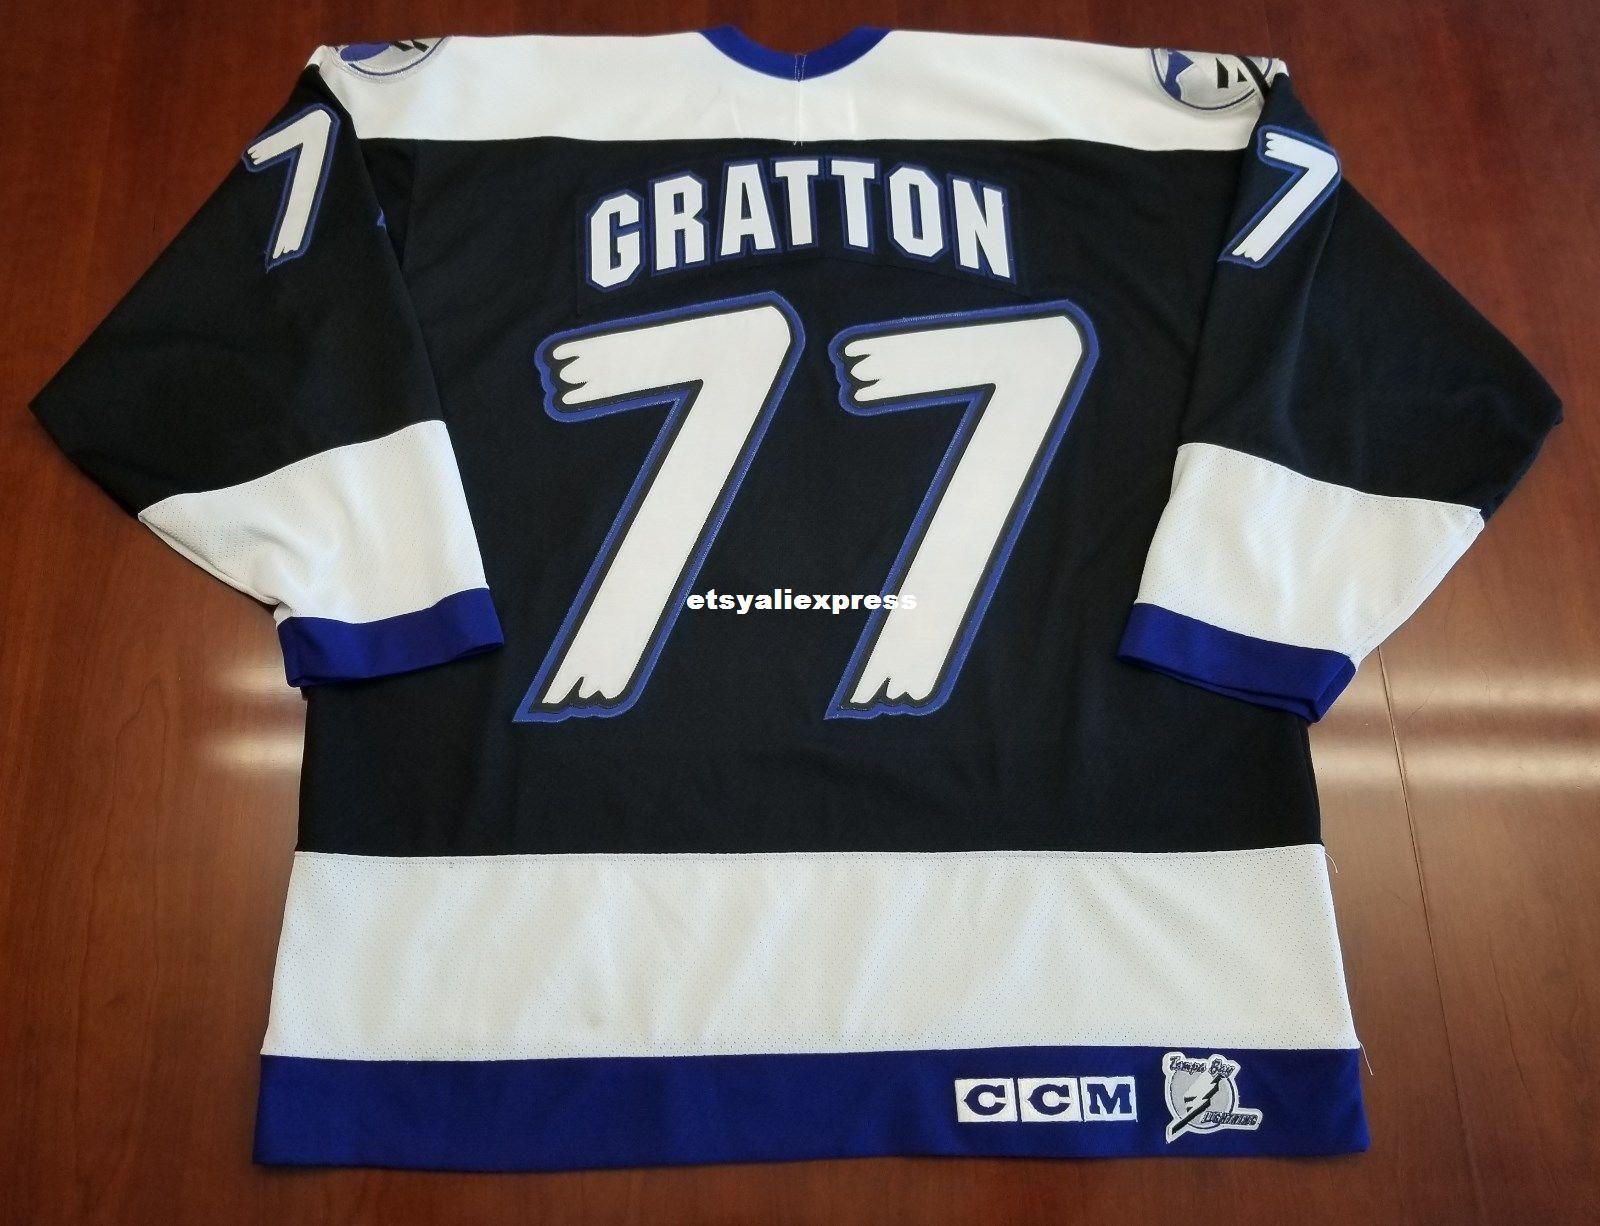 best service 9a91b e8331 Wholesale Chris Gratton #77 Tampa Bay Lightning Vintage CCM Cheap Hockey  Jersey Black Mens Retro Jerseys